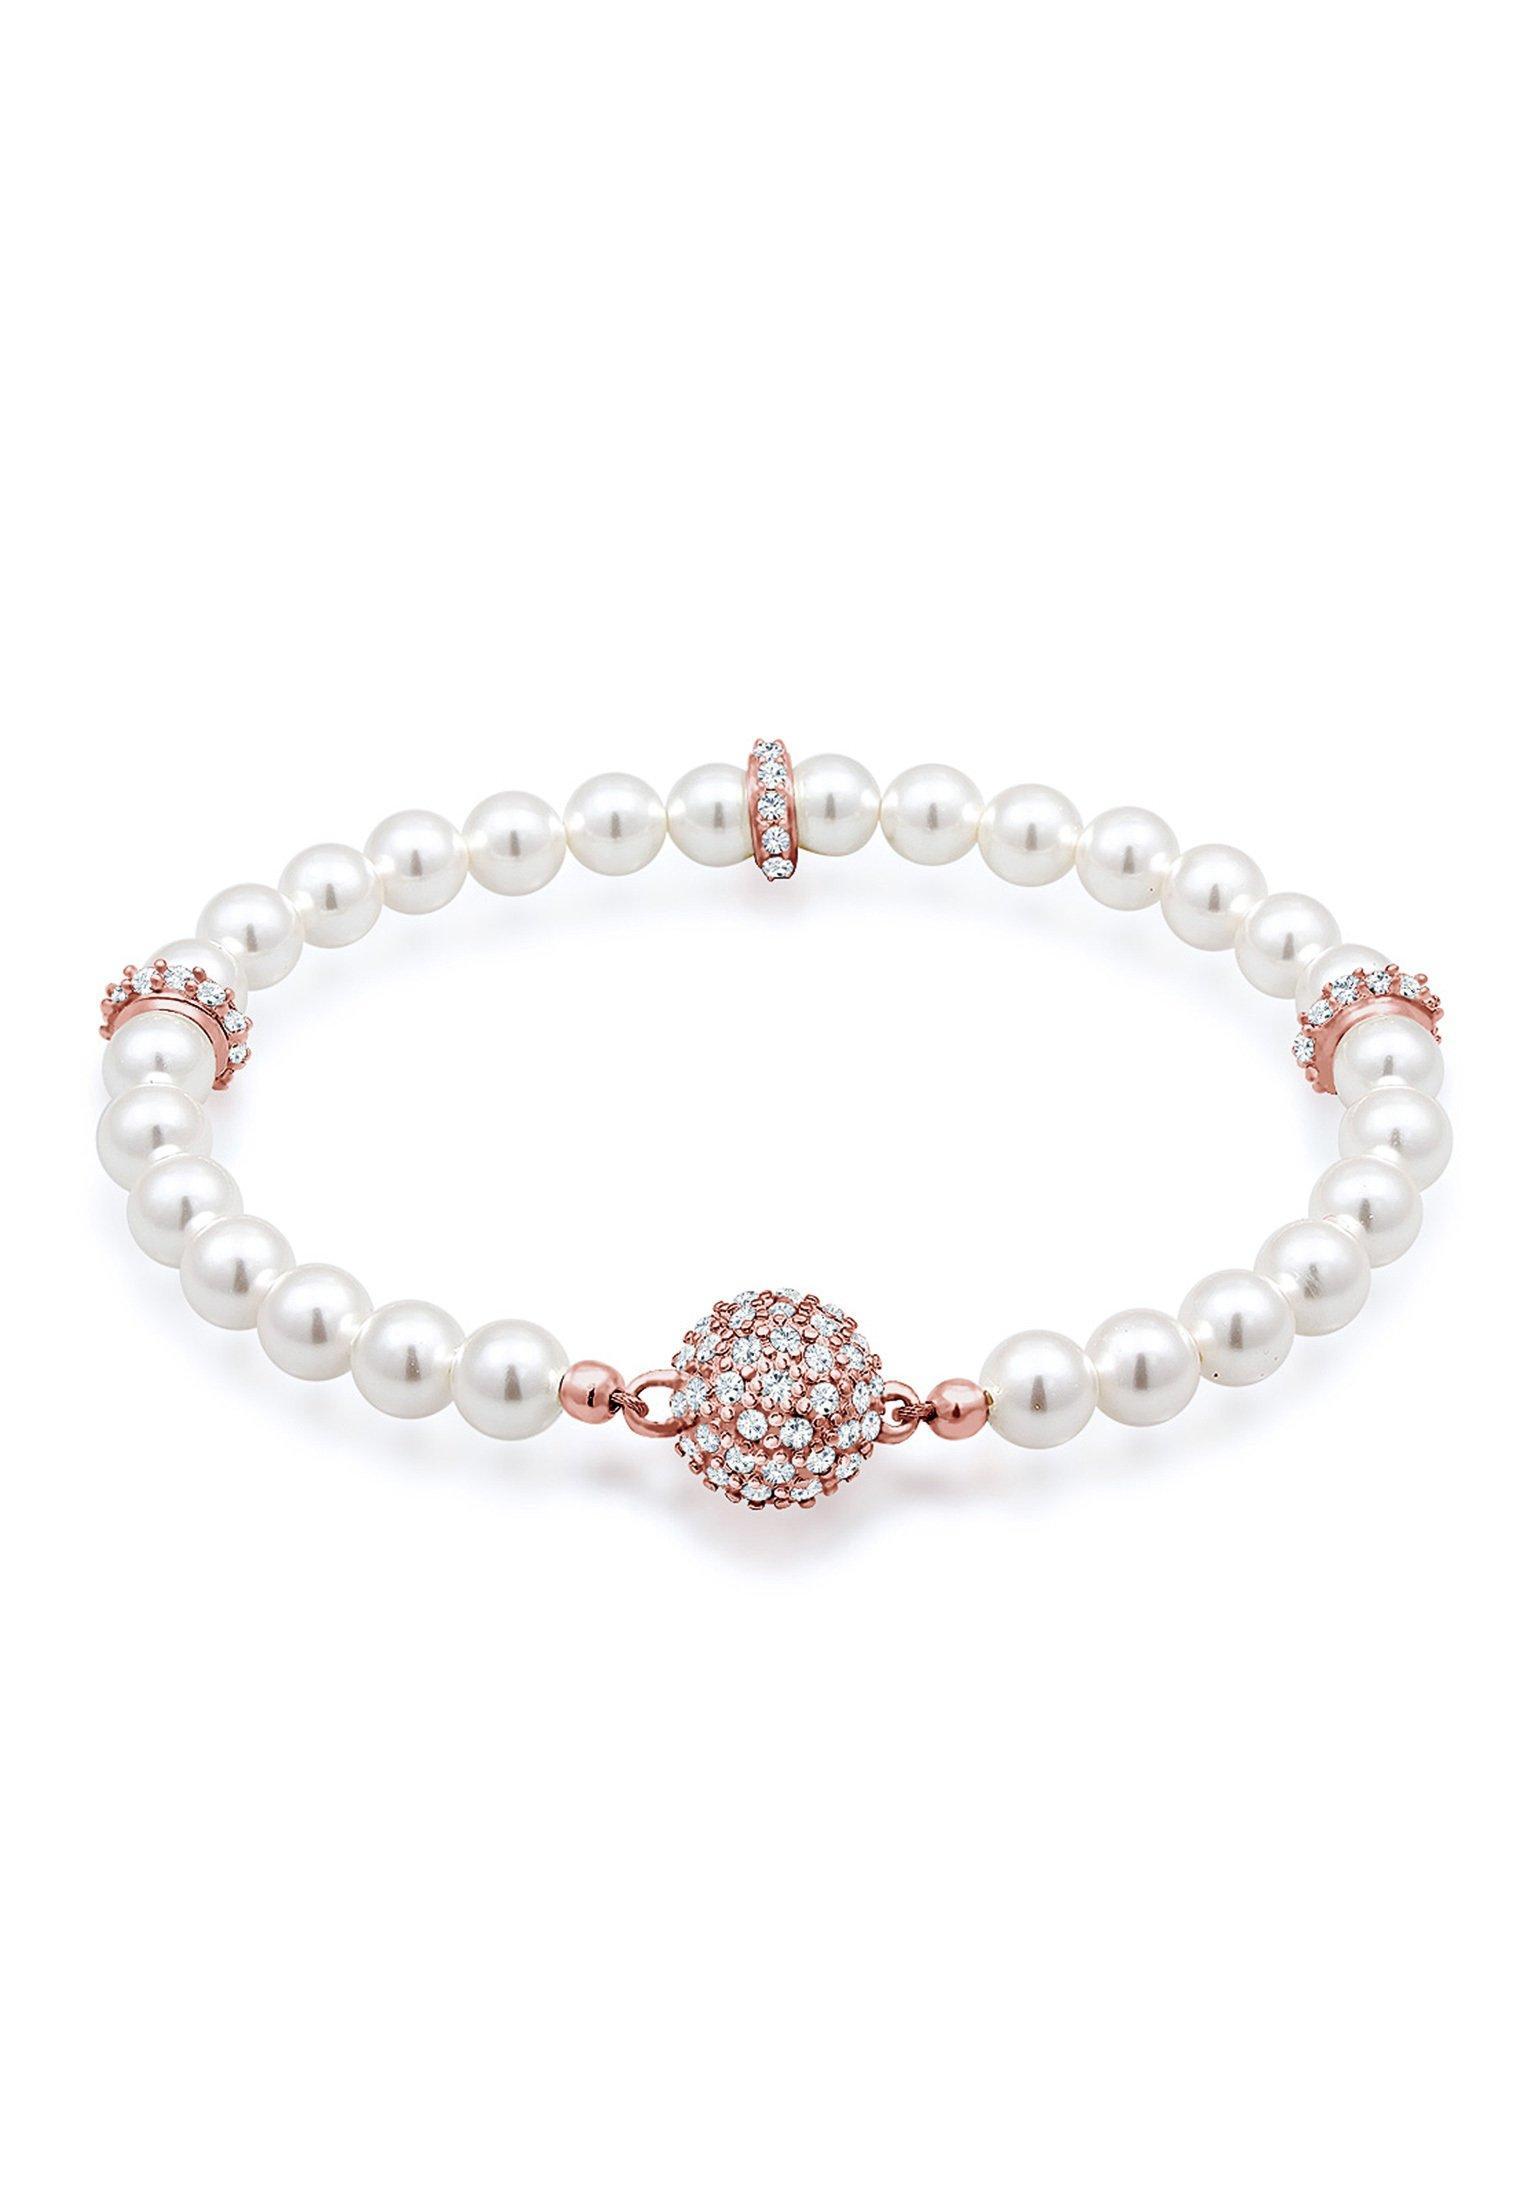 Elli Perlenarmband Kugel Magnet Perle Swarovski Kristalle 925 Silber